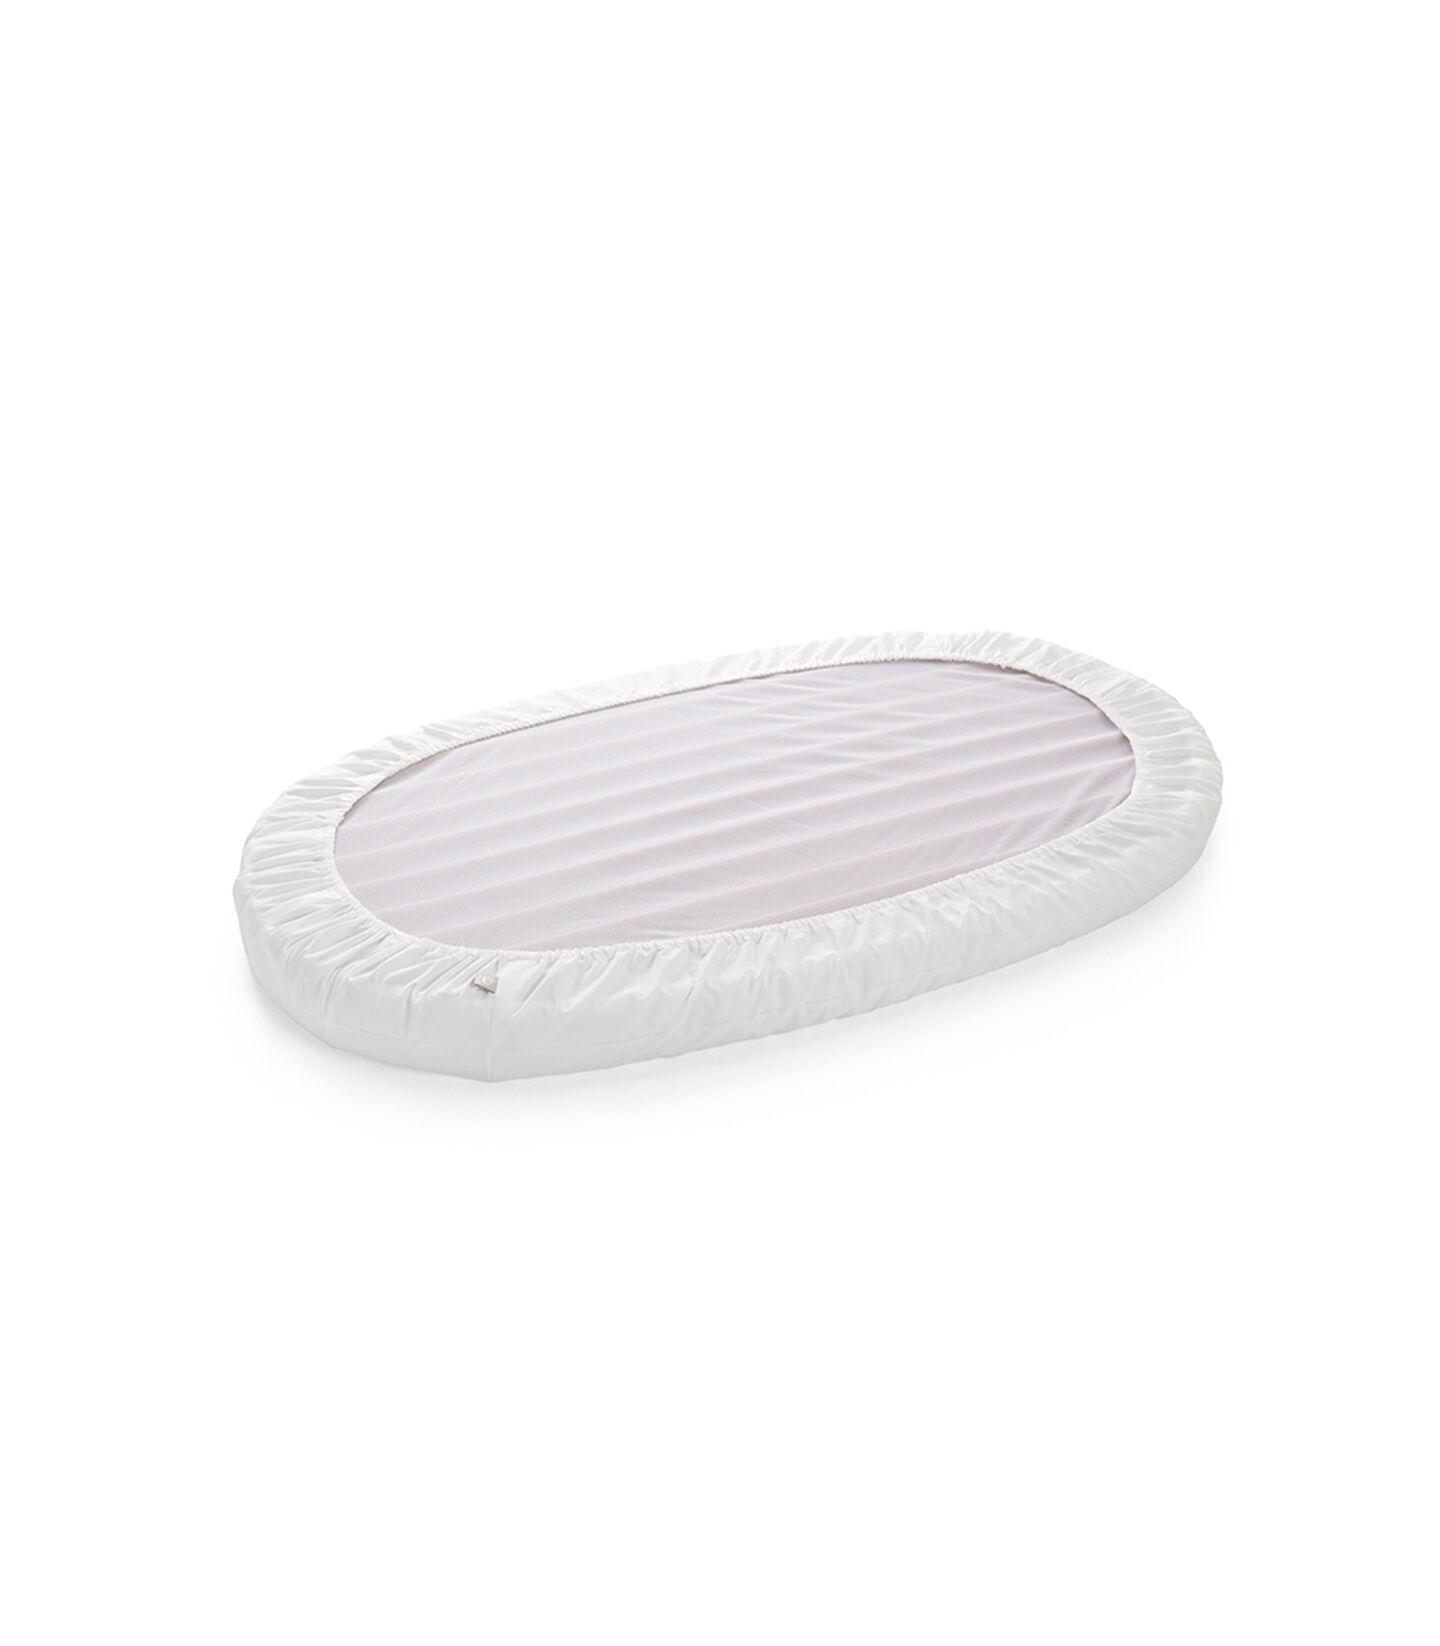 Stokke® Sleepi™ hoeslaken White, Wit, mainview view 2